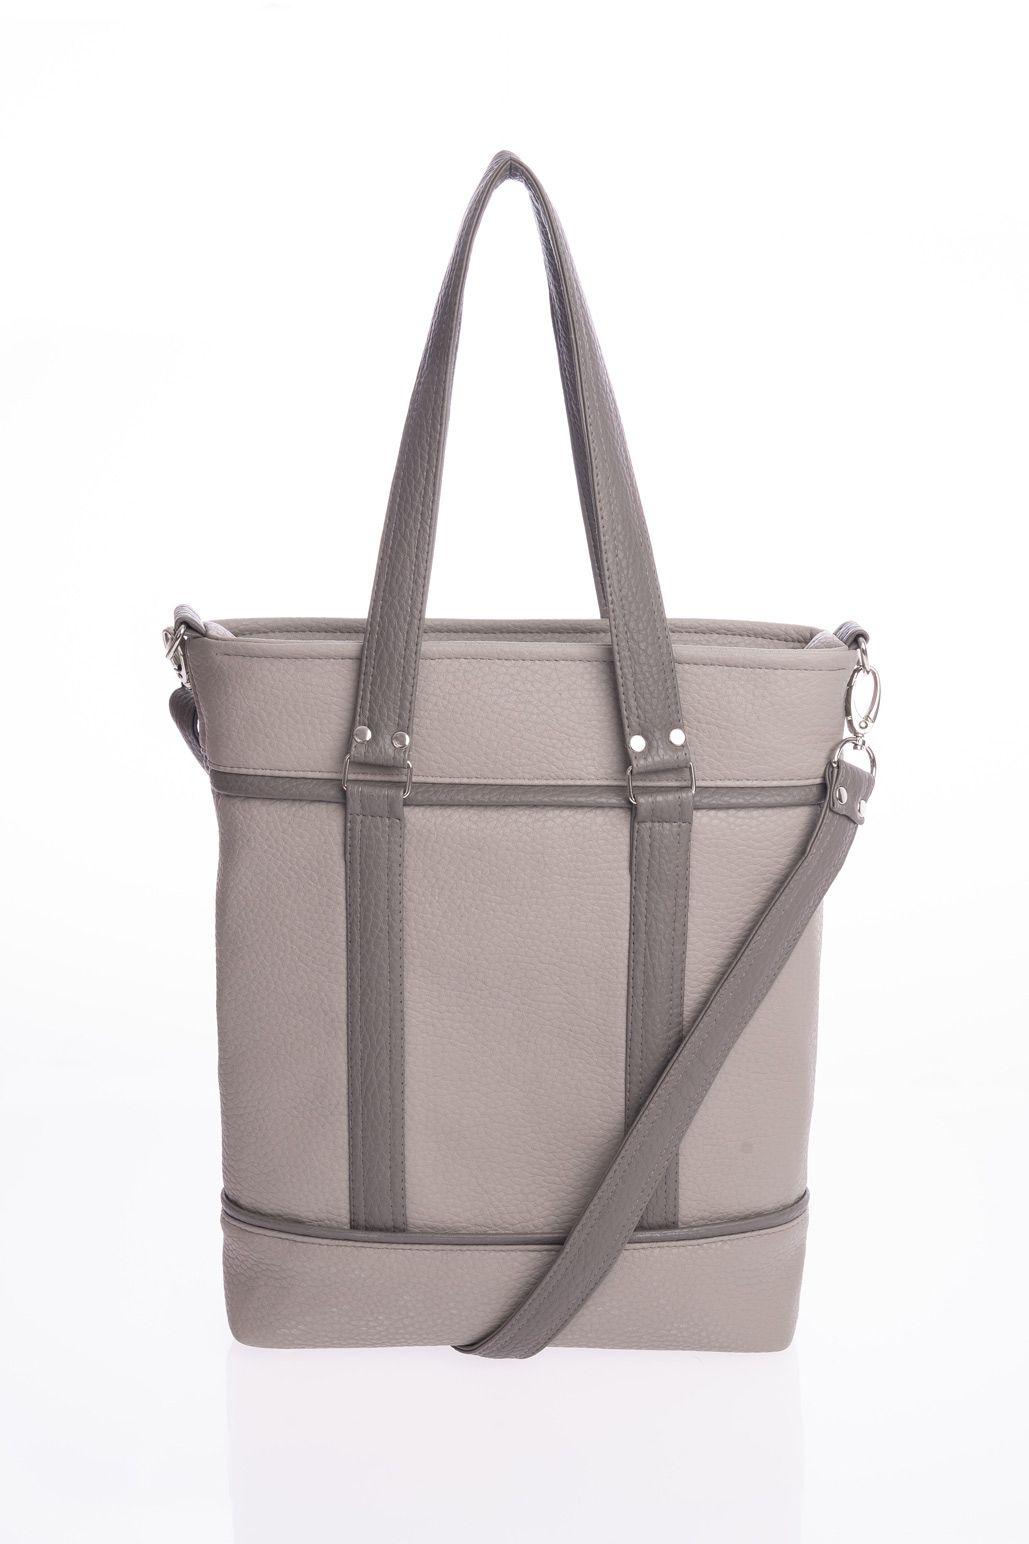 a48f71a73ebb kabelka  handbag  crossbody  grey  šedá  jaro  handmade